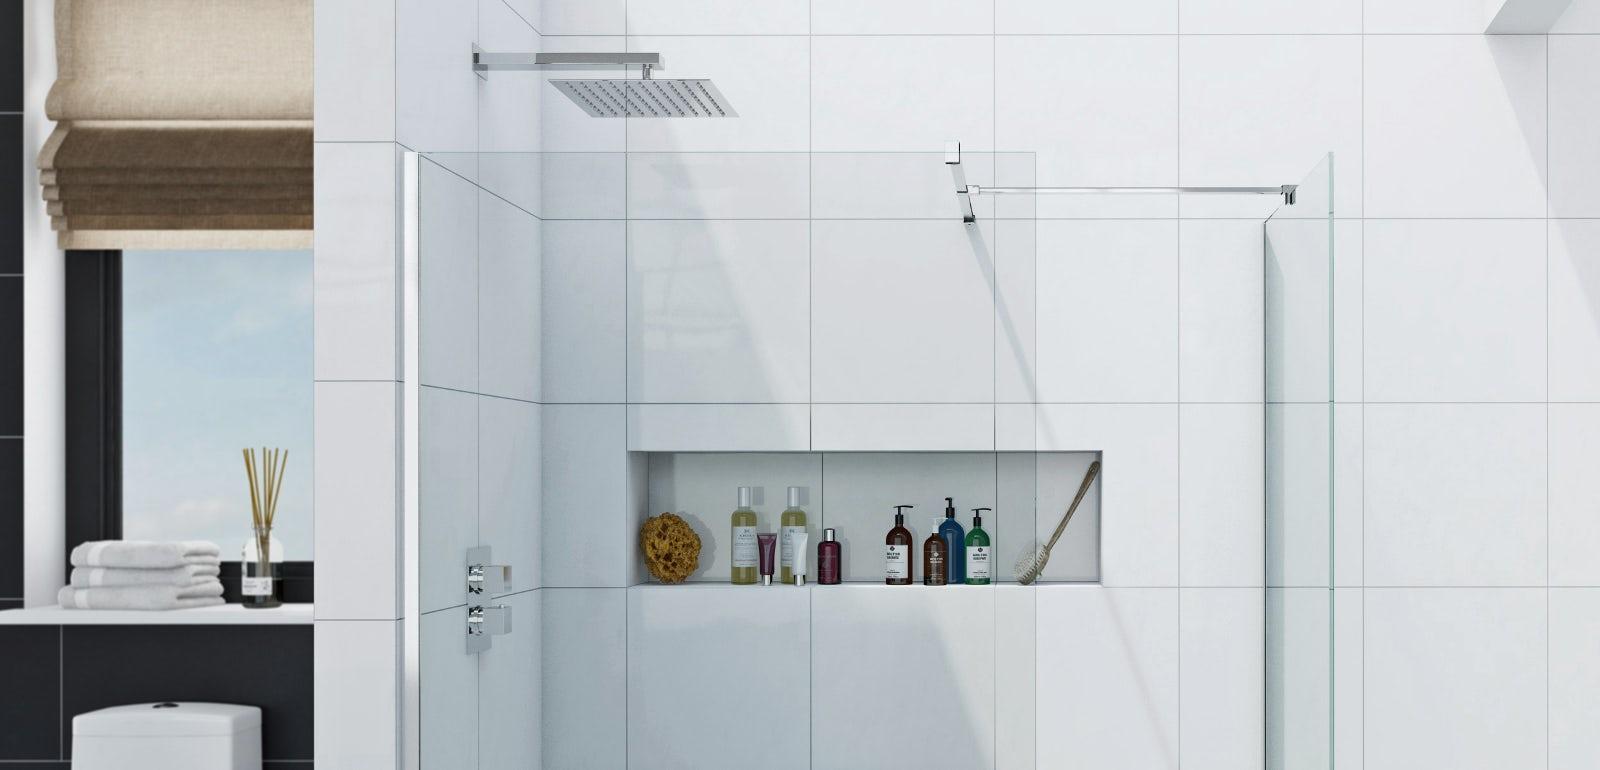 Superieur Get Started Using 3D Design Software For Planning Your Bathroom